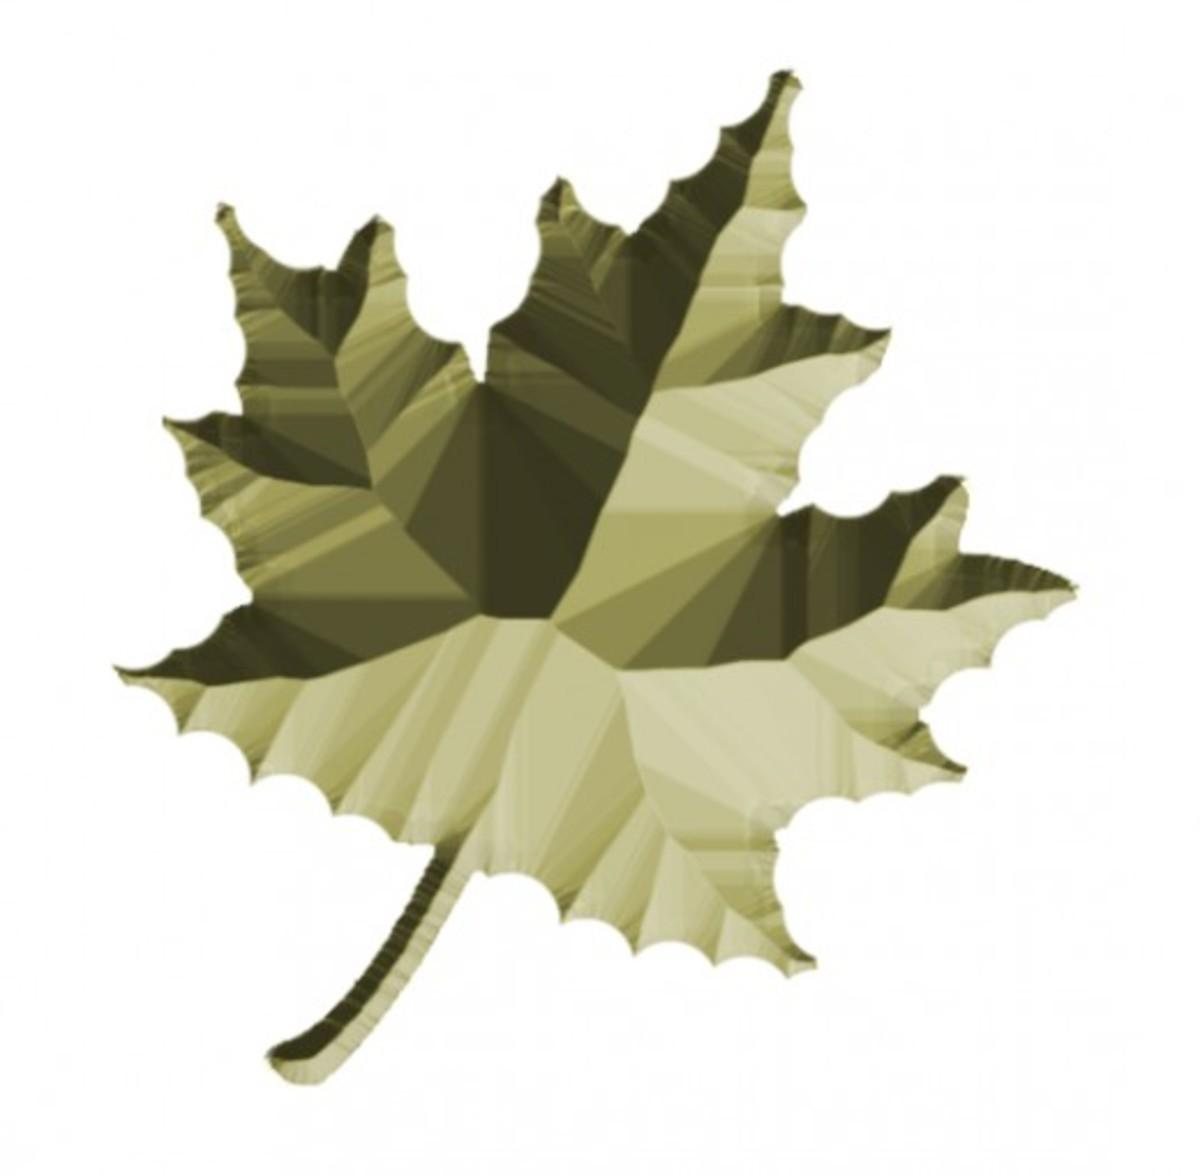 Textured foliage 1.